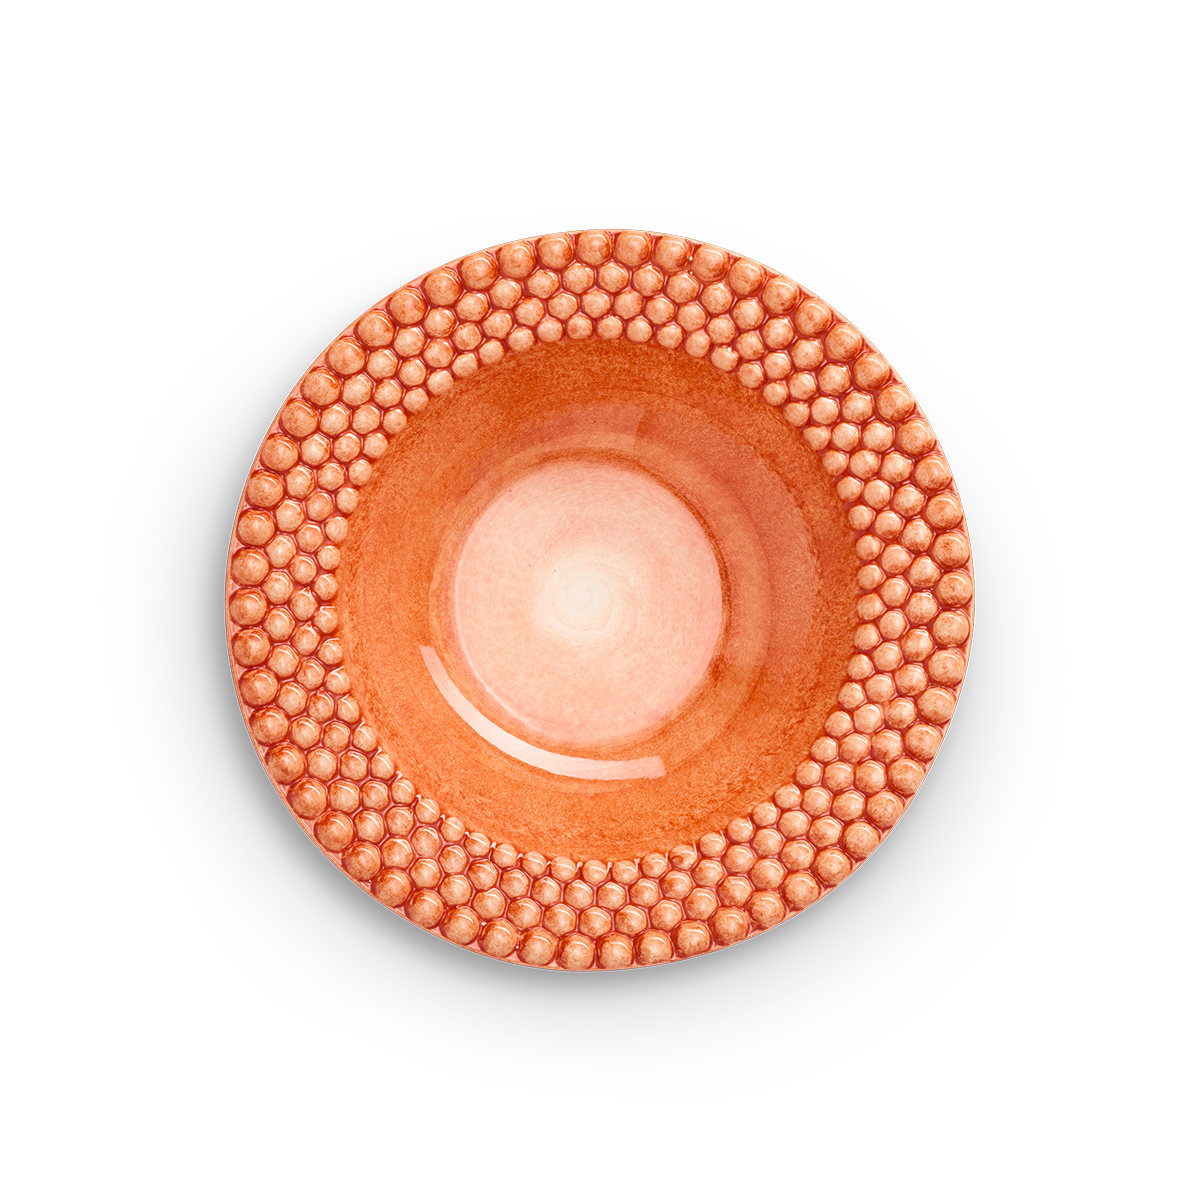 Bubbles Sopptallrik Orange 25 cm